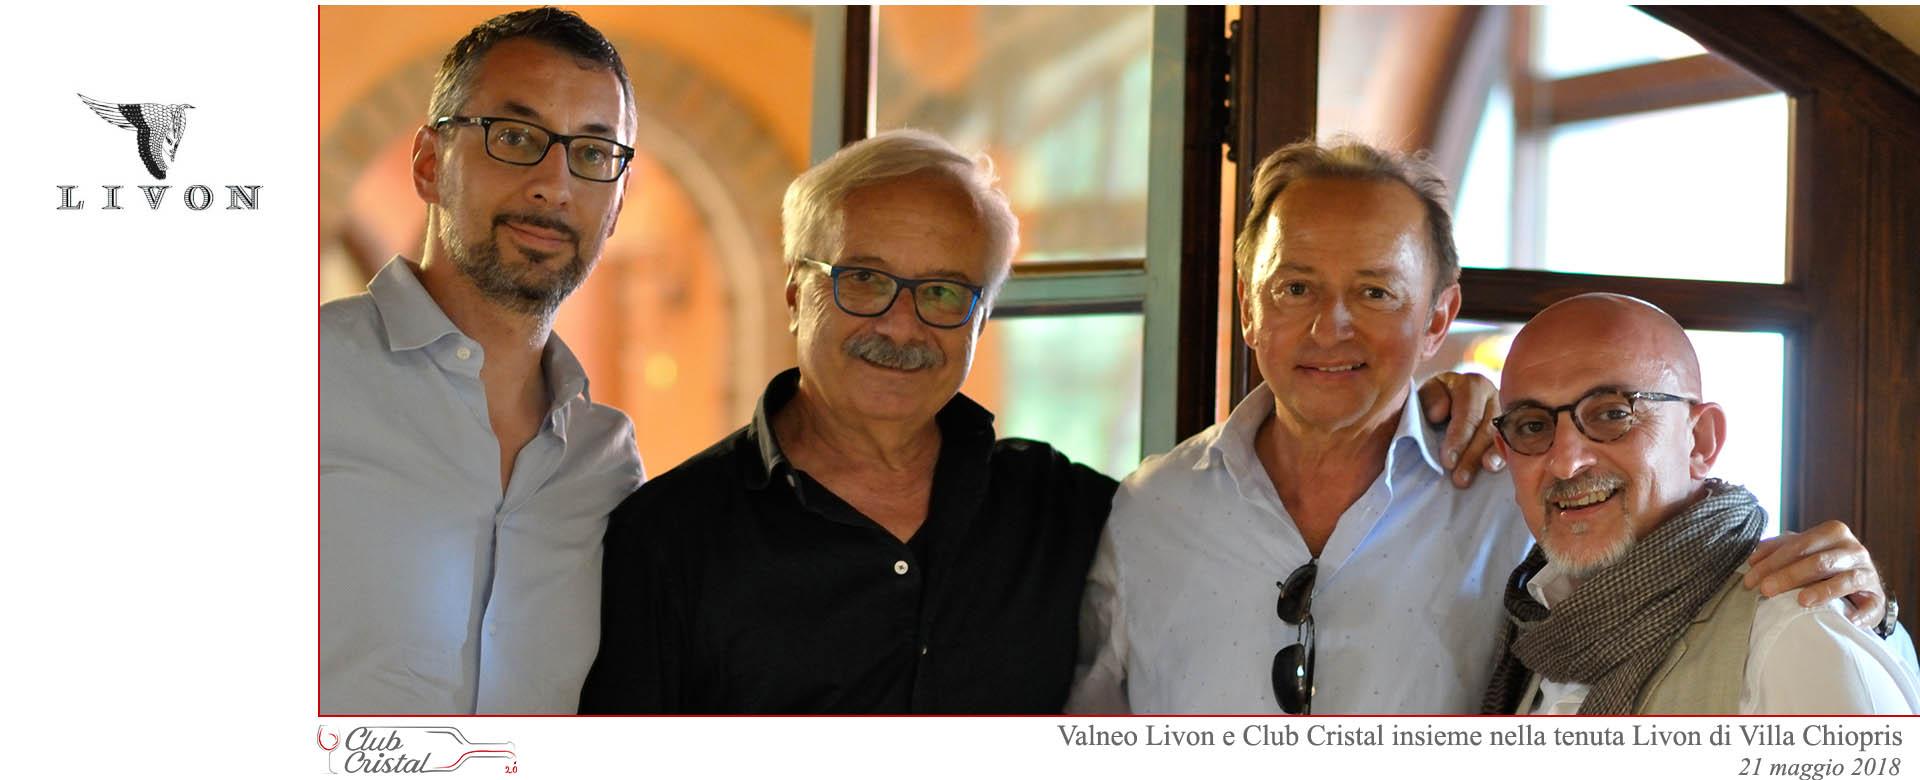 Livon a Villa Chiopris